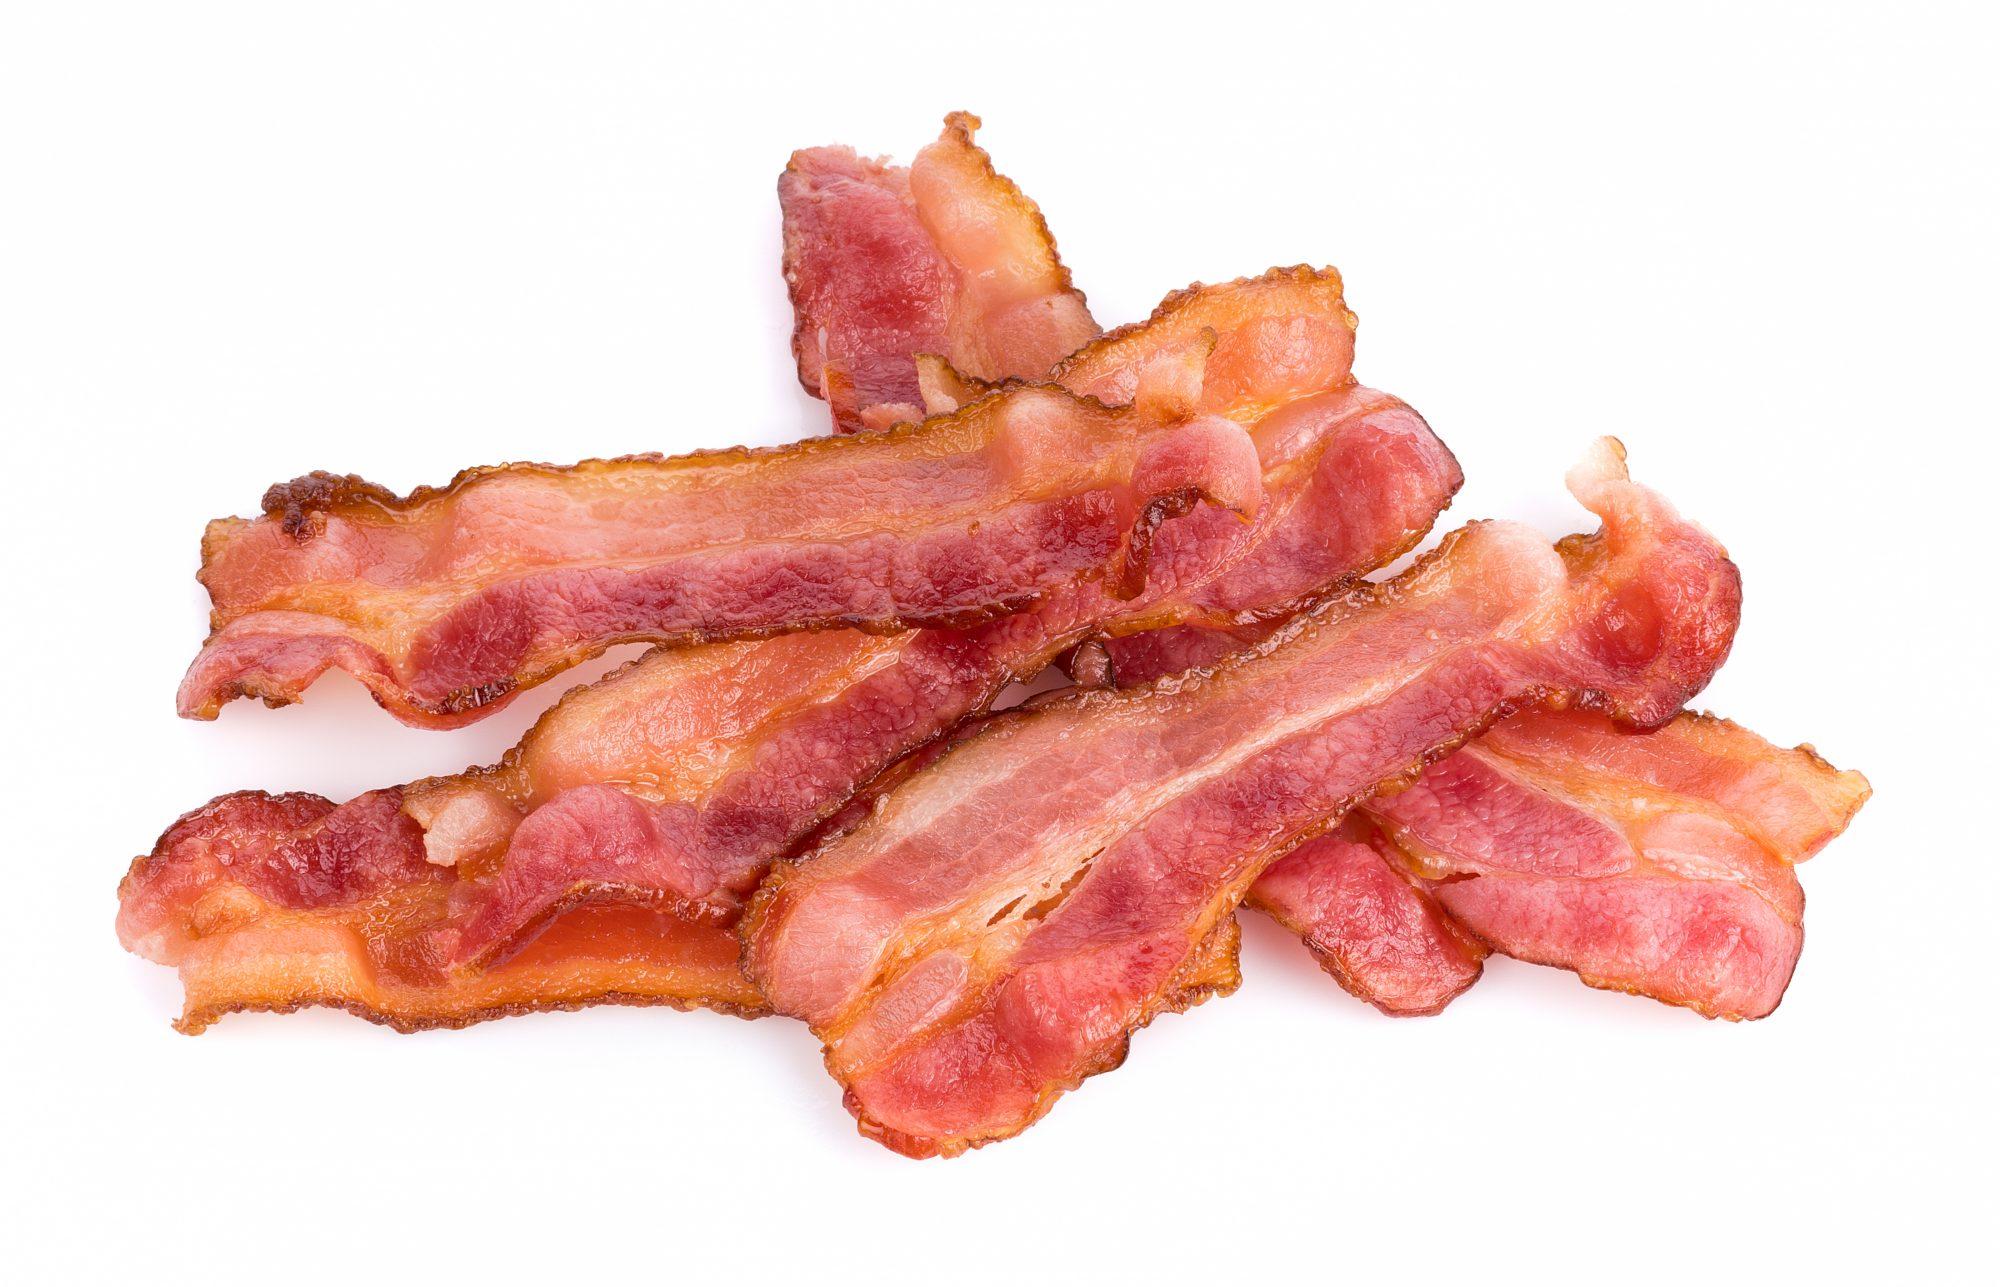 Bacon Getty 12/2/19